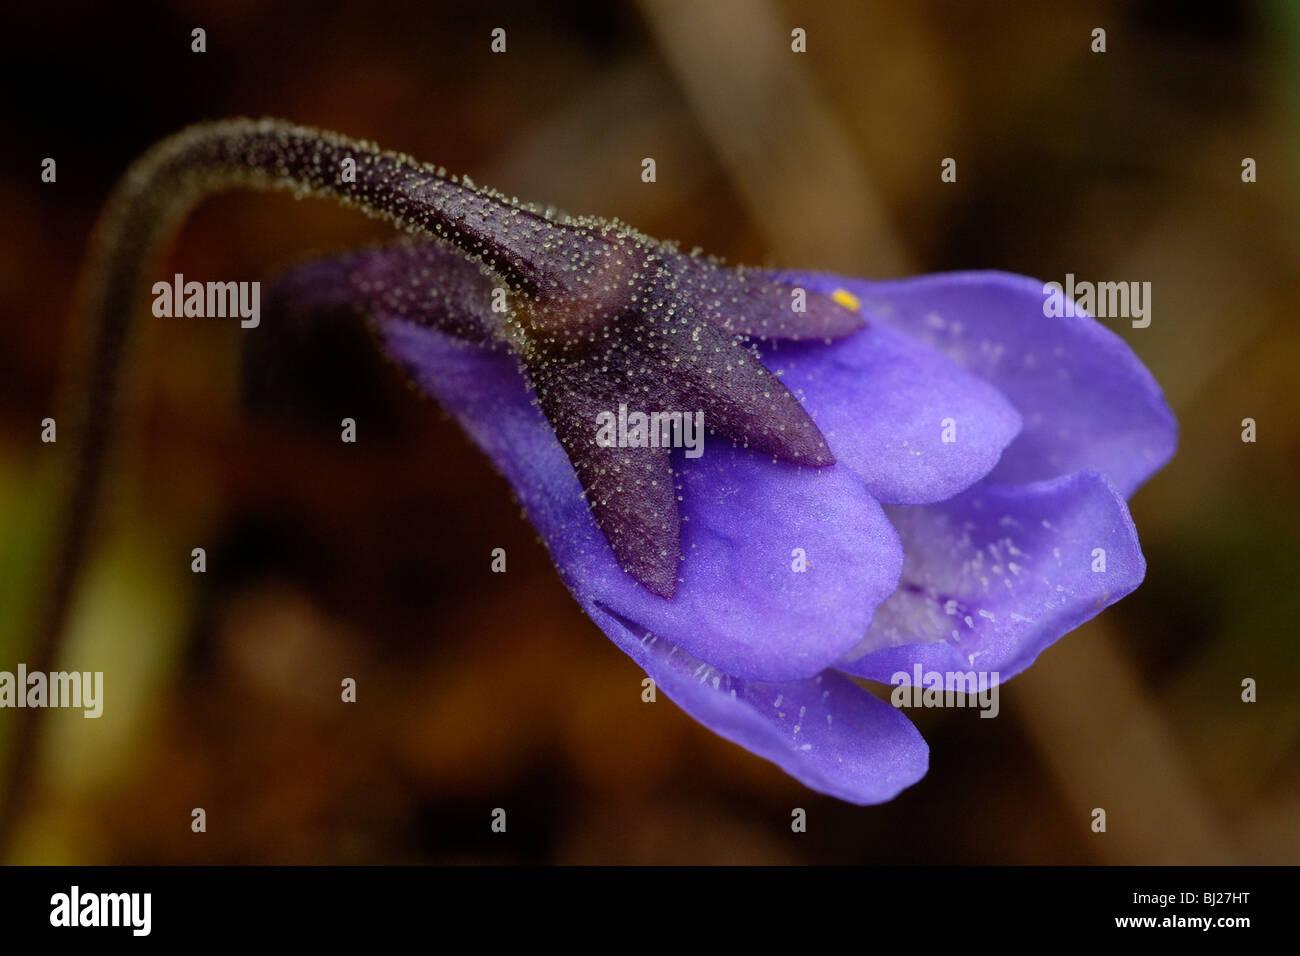 Common Butterwort, pinguicula vulgaris - Stock Image